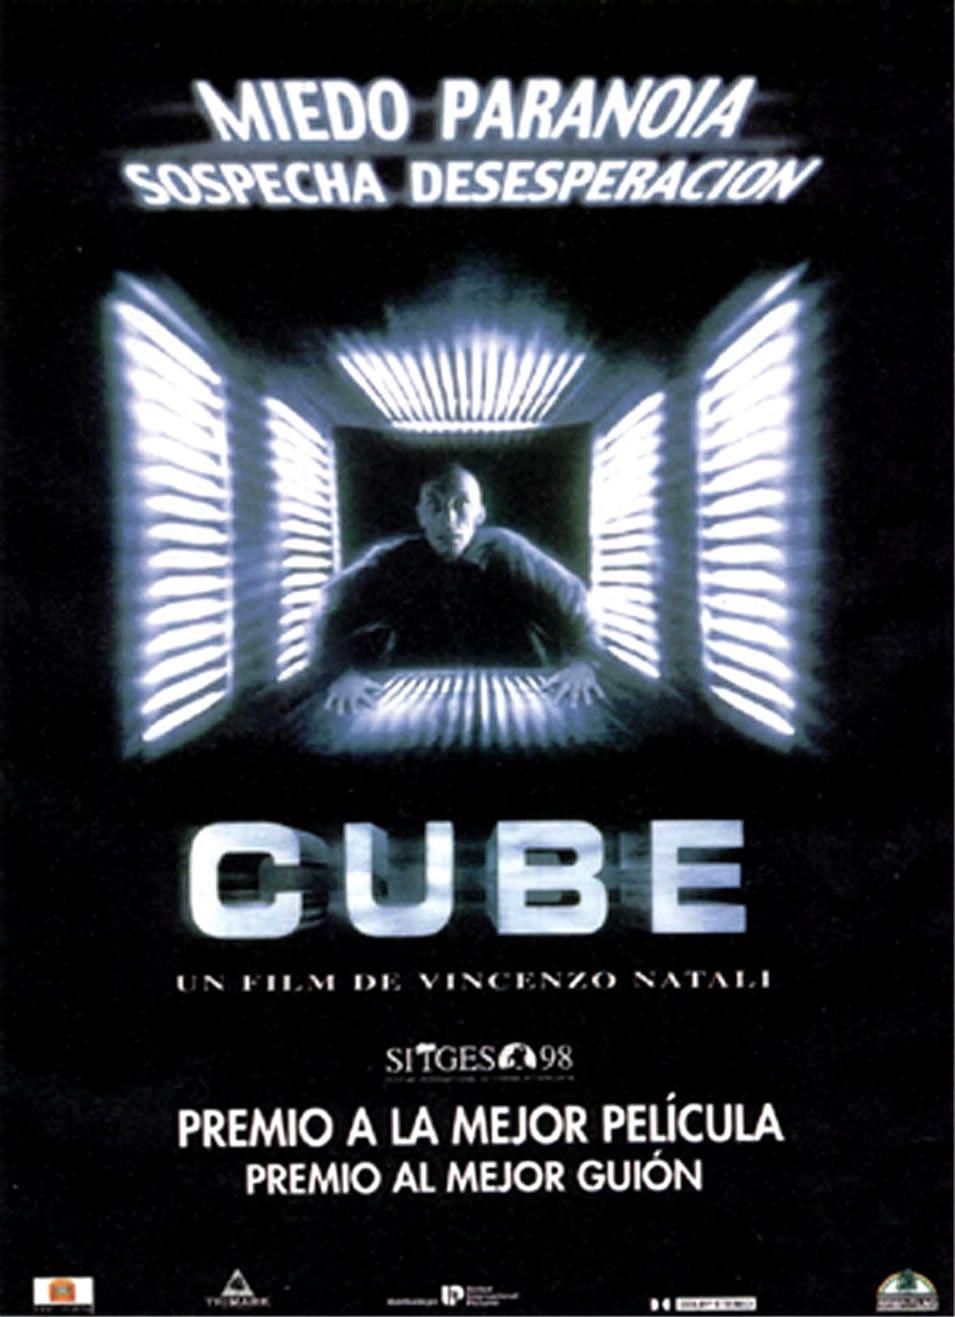 Contraprogramar Cube con Plan de escape